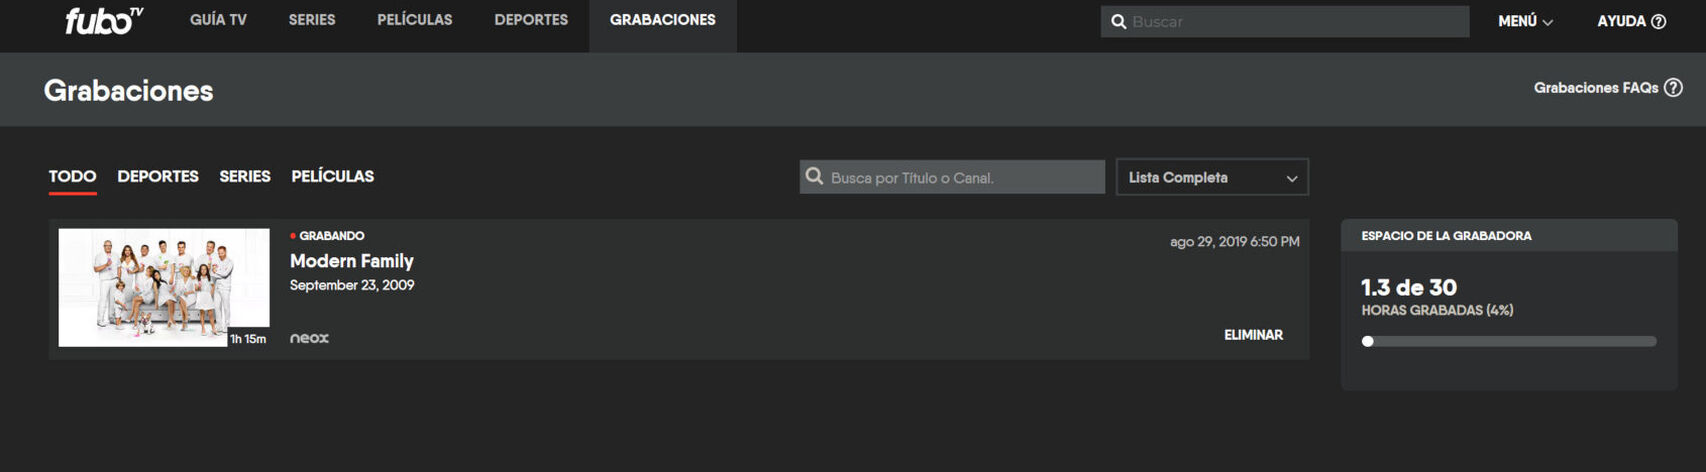 تسجيل FuboTV